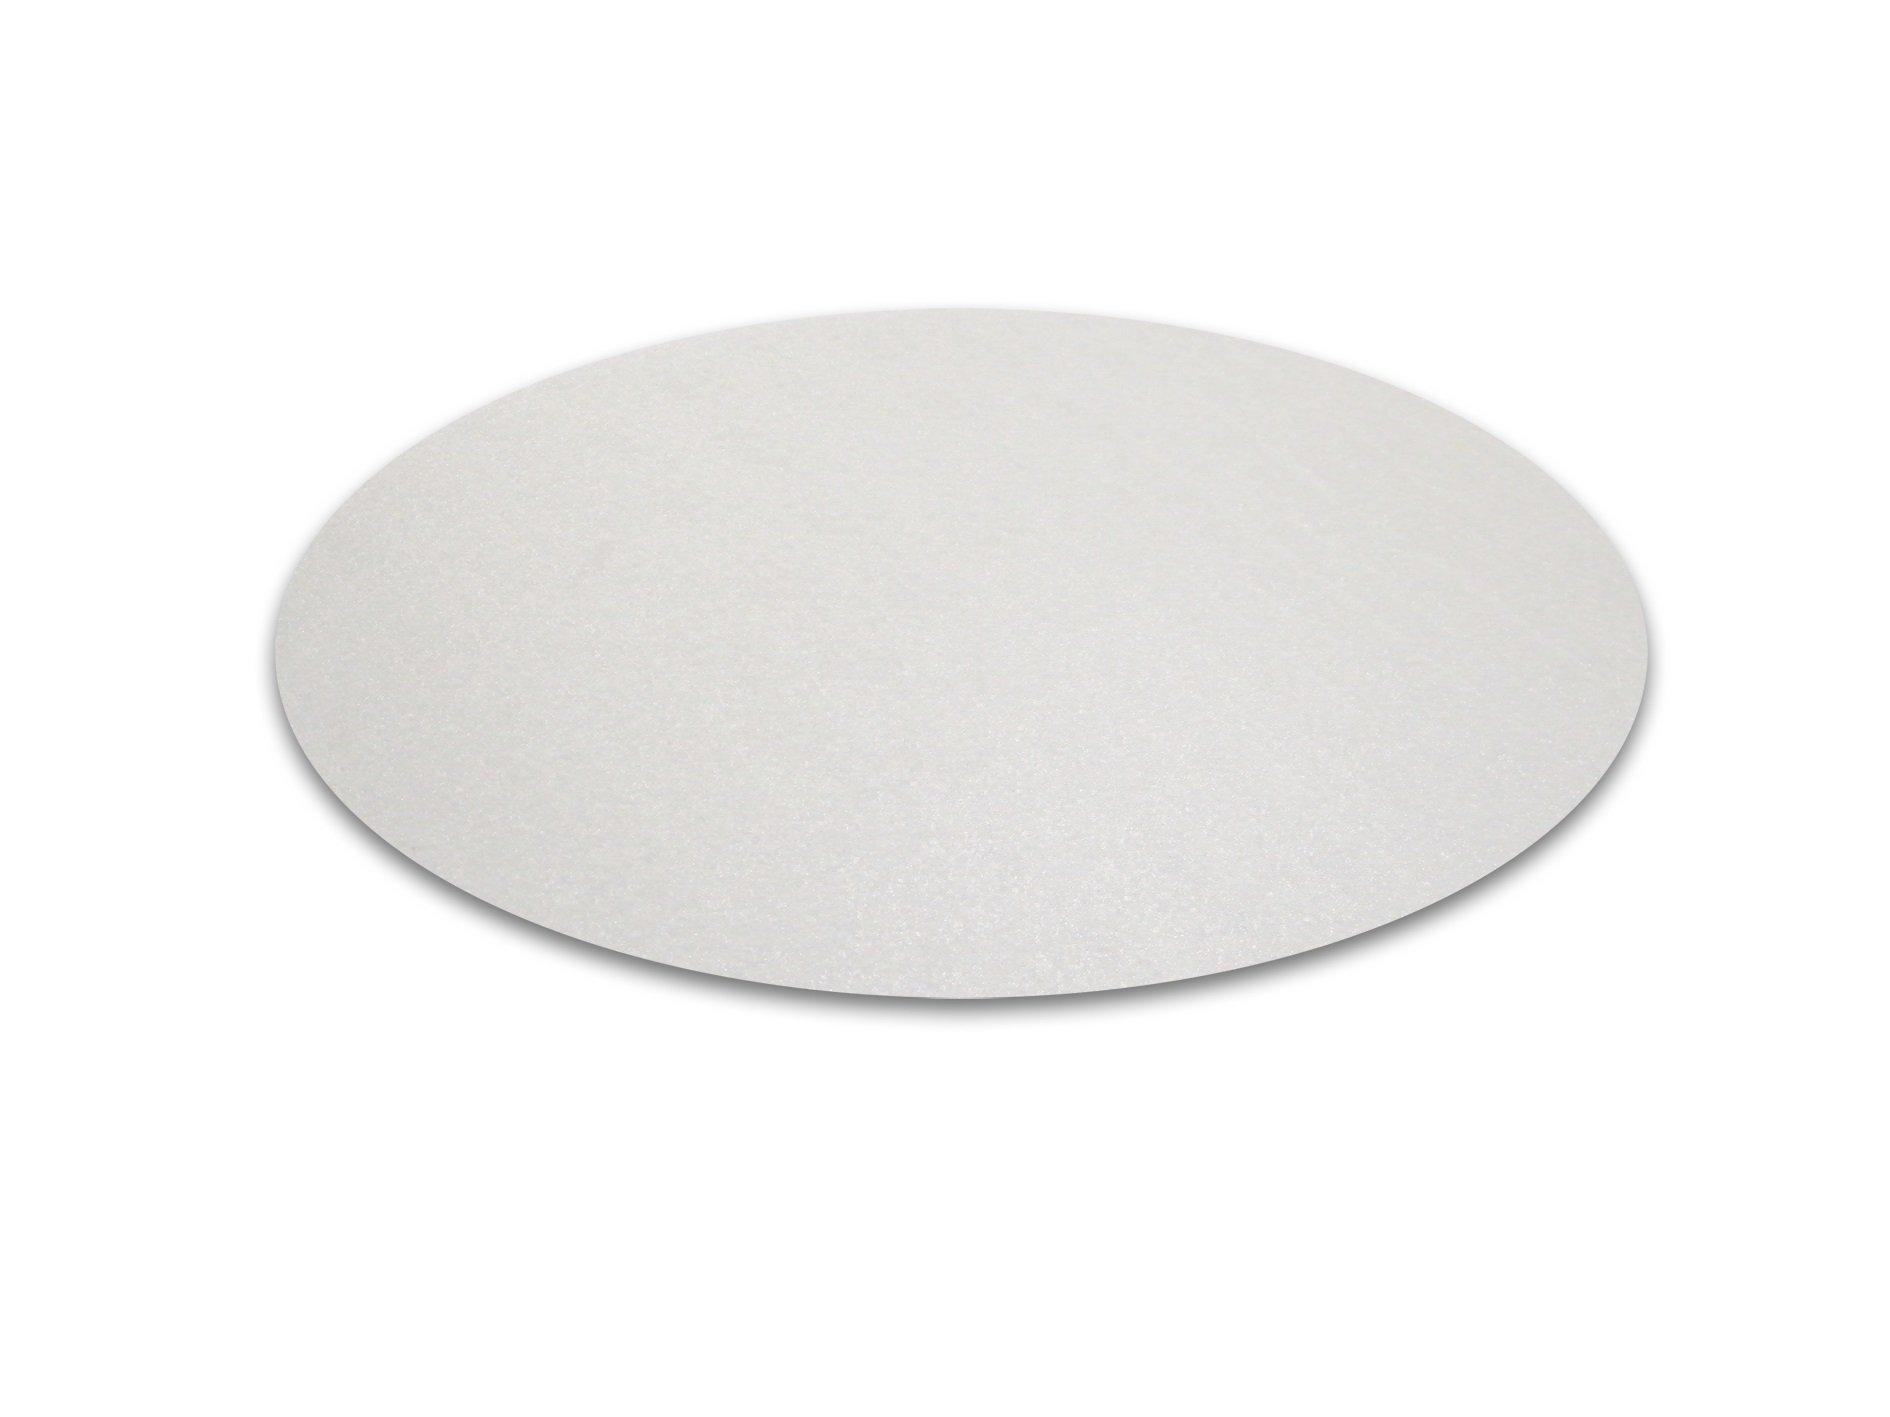 Cleartex Circular General Purpose Floor Mat, Polycarbonate, for Hard Floors, Round, 36'' Diameter (FC129020RR)